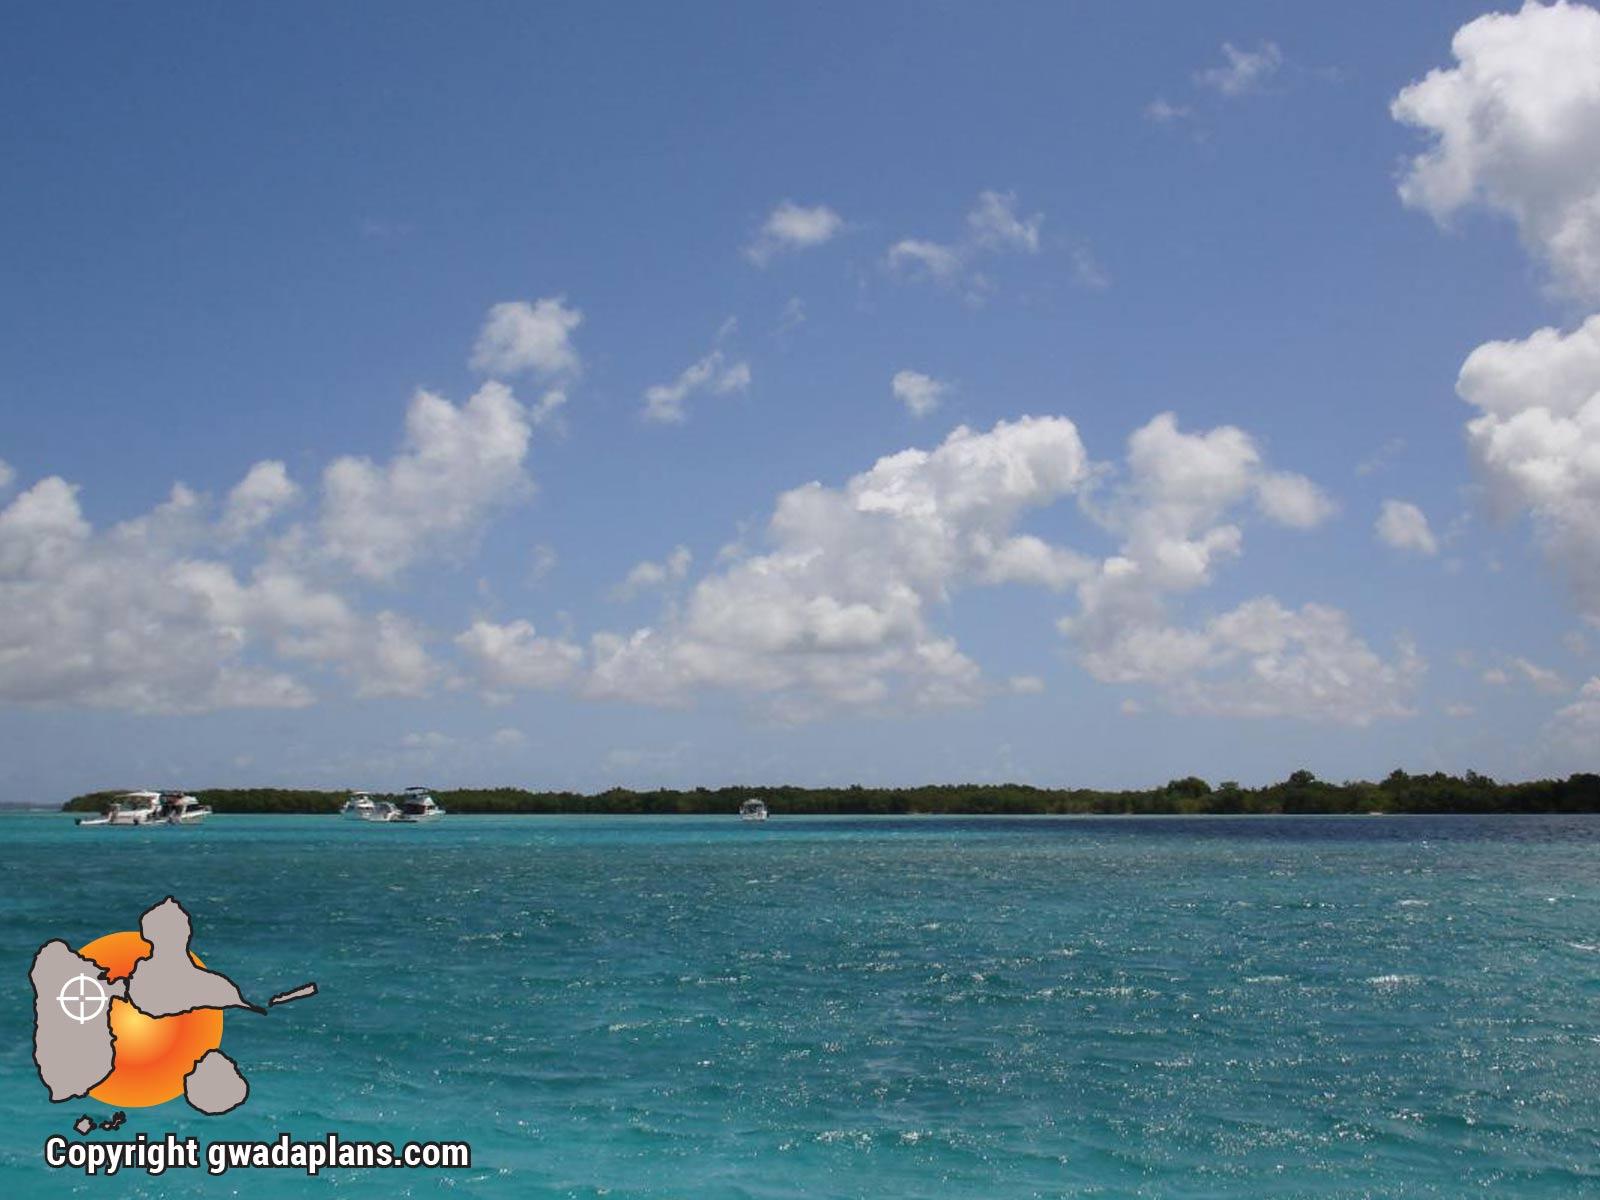 Ilet Fajou - Guadeloupe